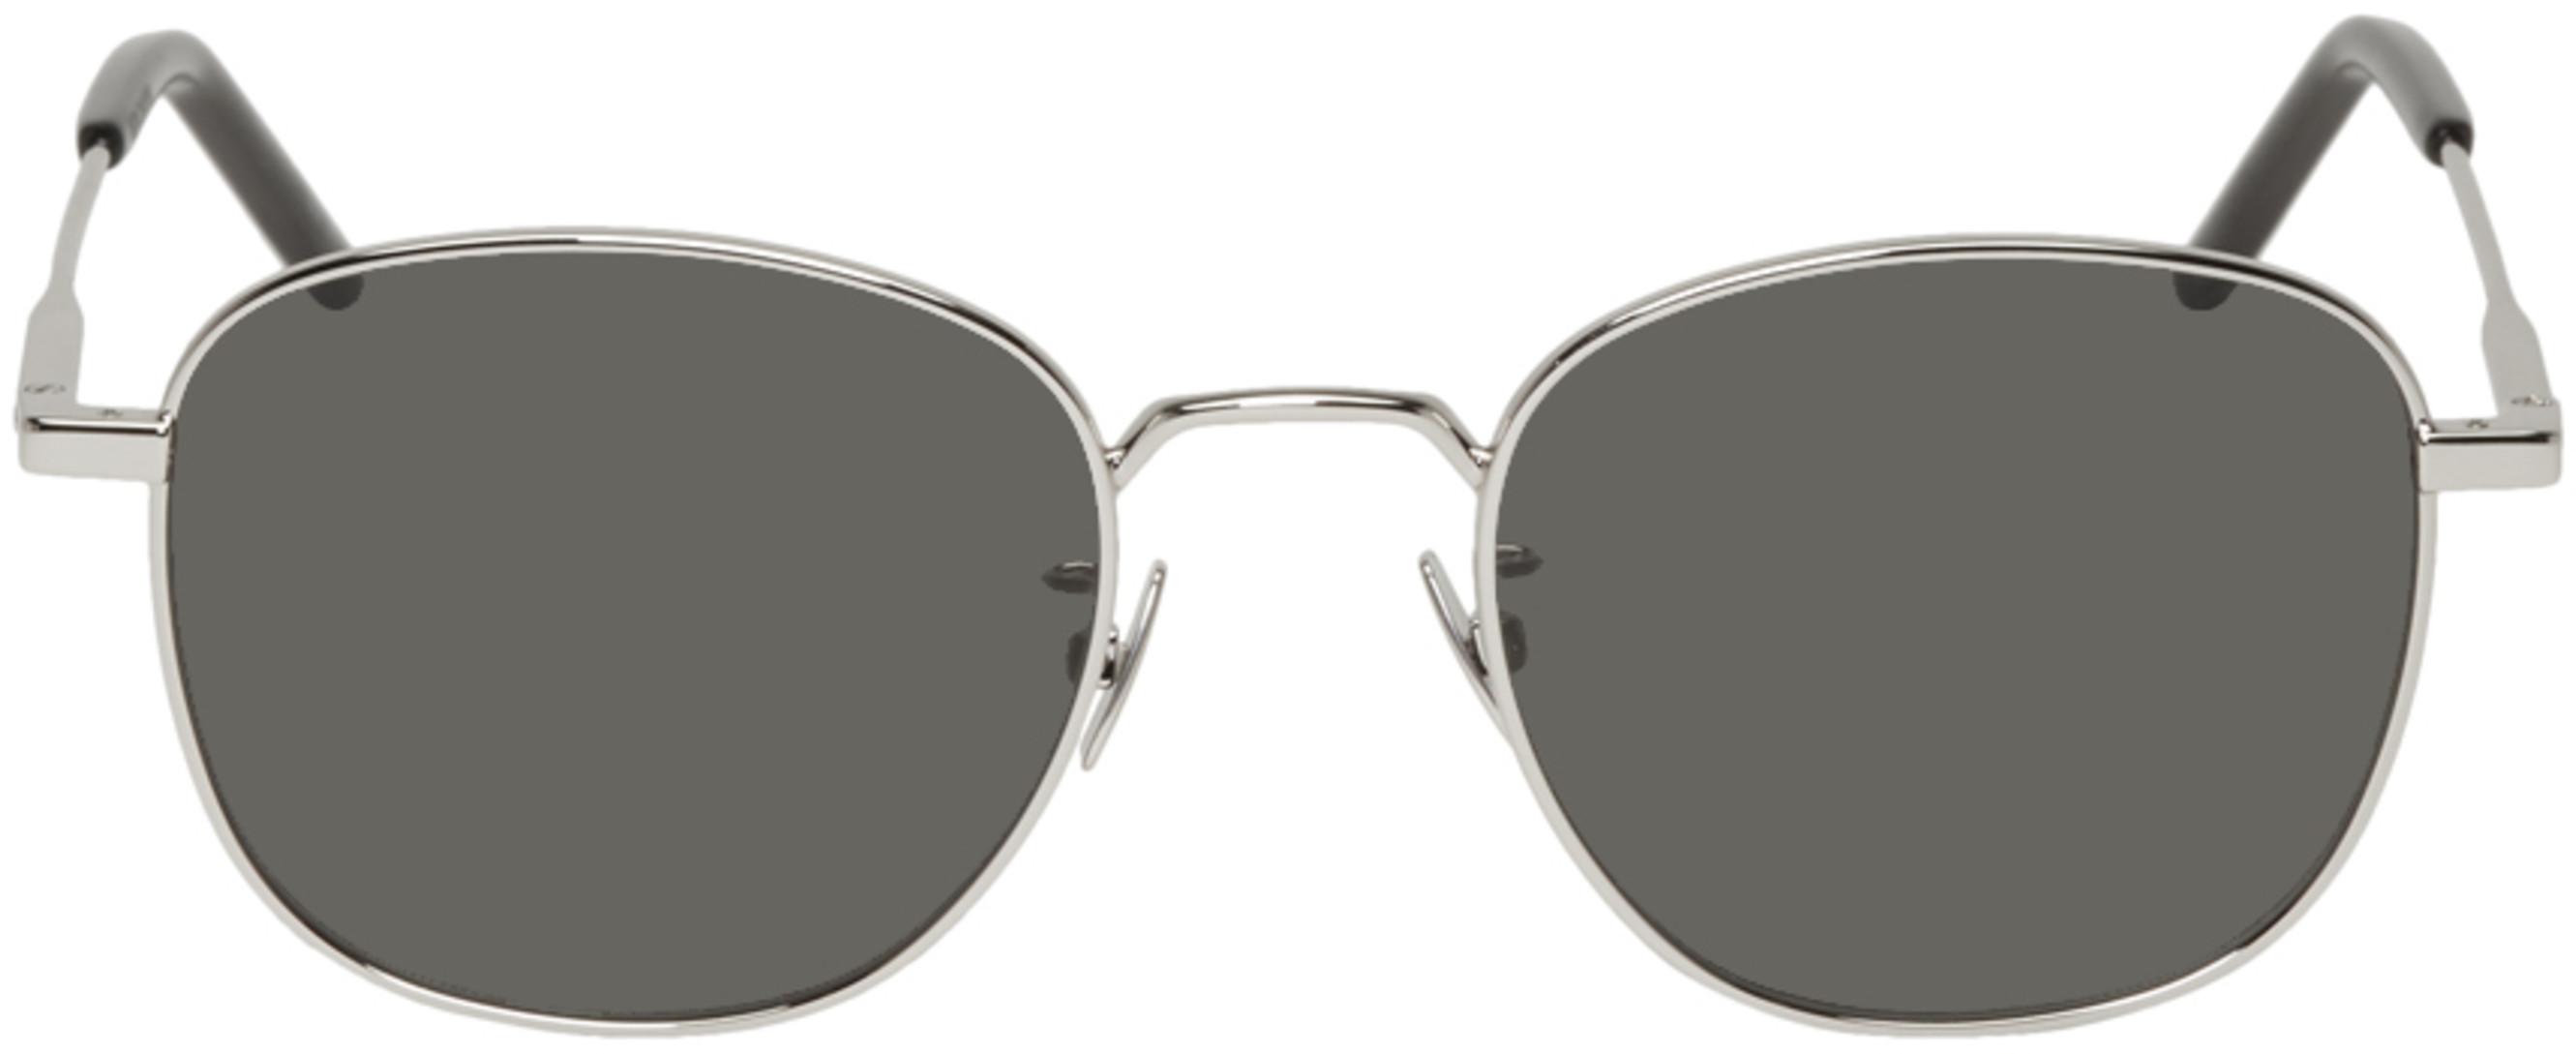 0b99010a966e Designer eyewear for Women | SSENSE